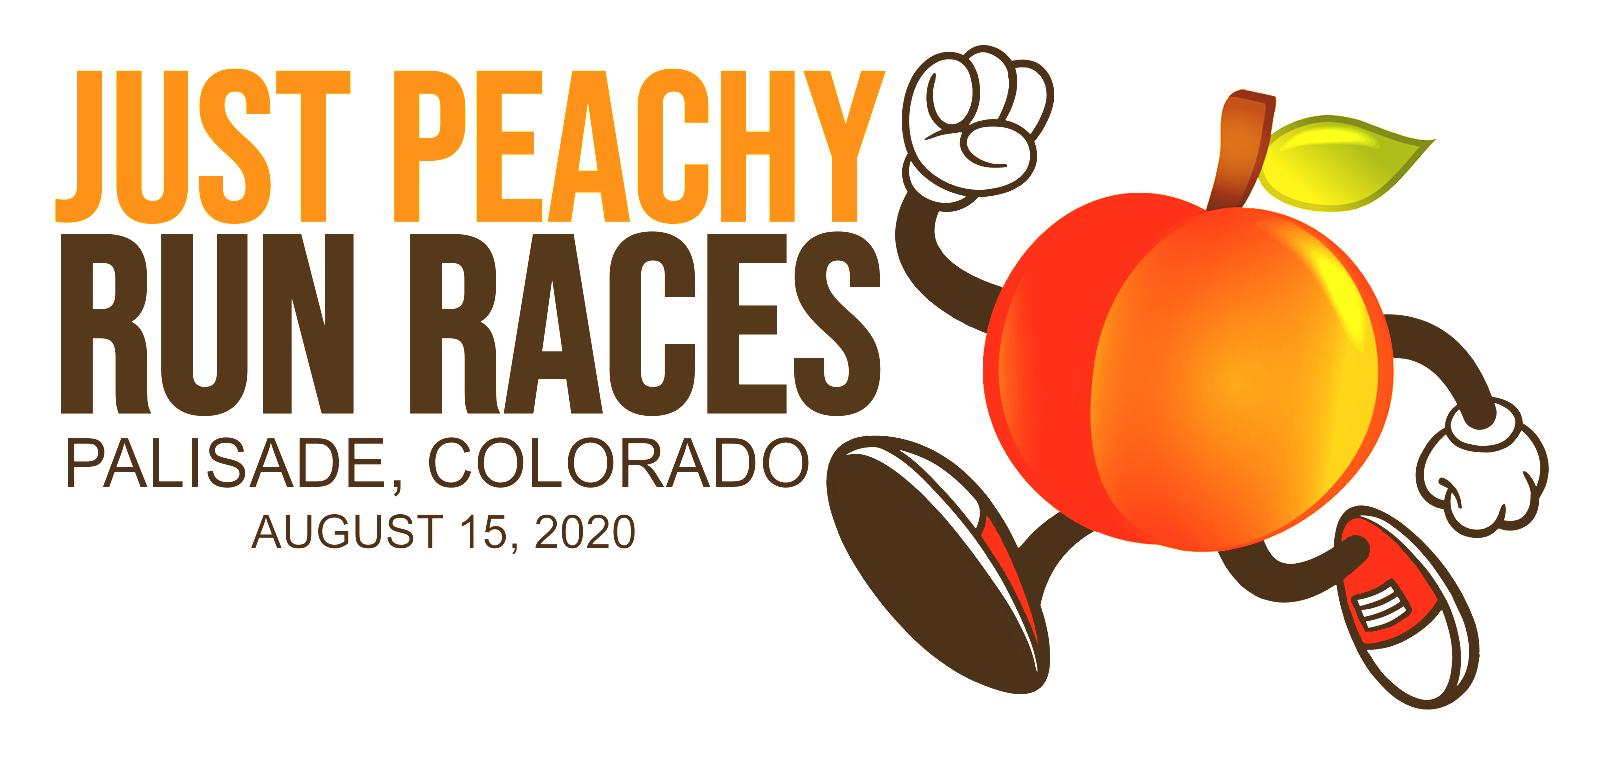 Palisade Bluegrass Festival 2020.Just Peachy Run Races